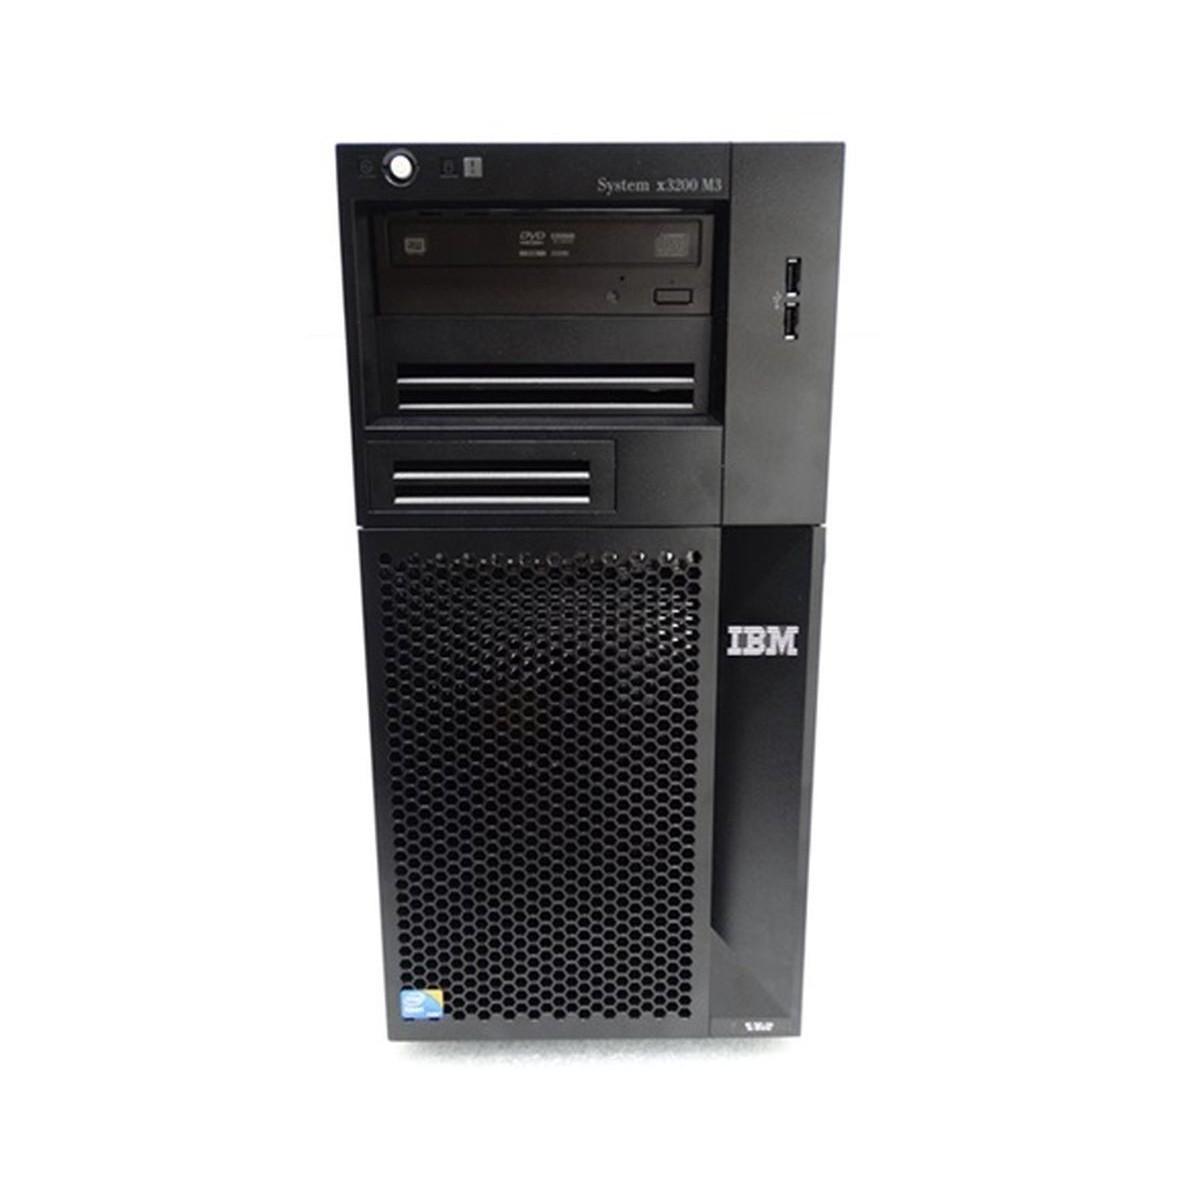 IBM X3200 M3 3.06 i3 540 8GB 2x250GB SATA